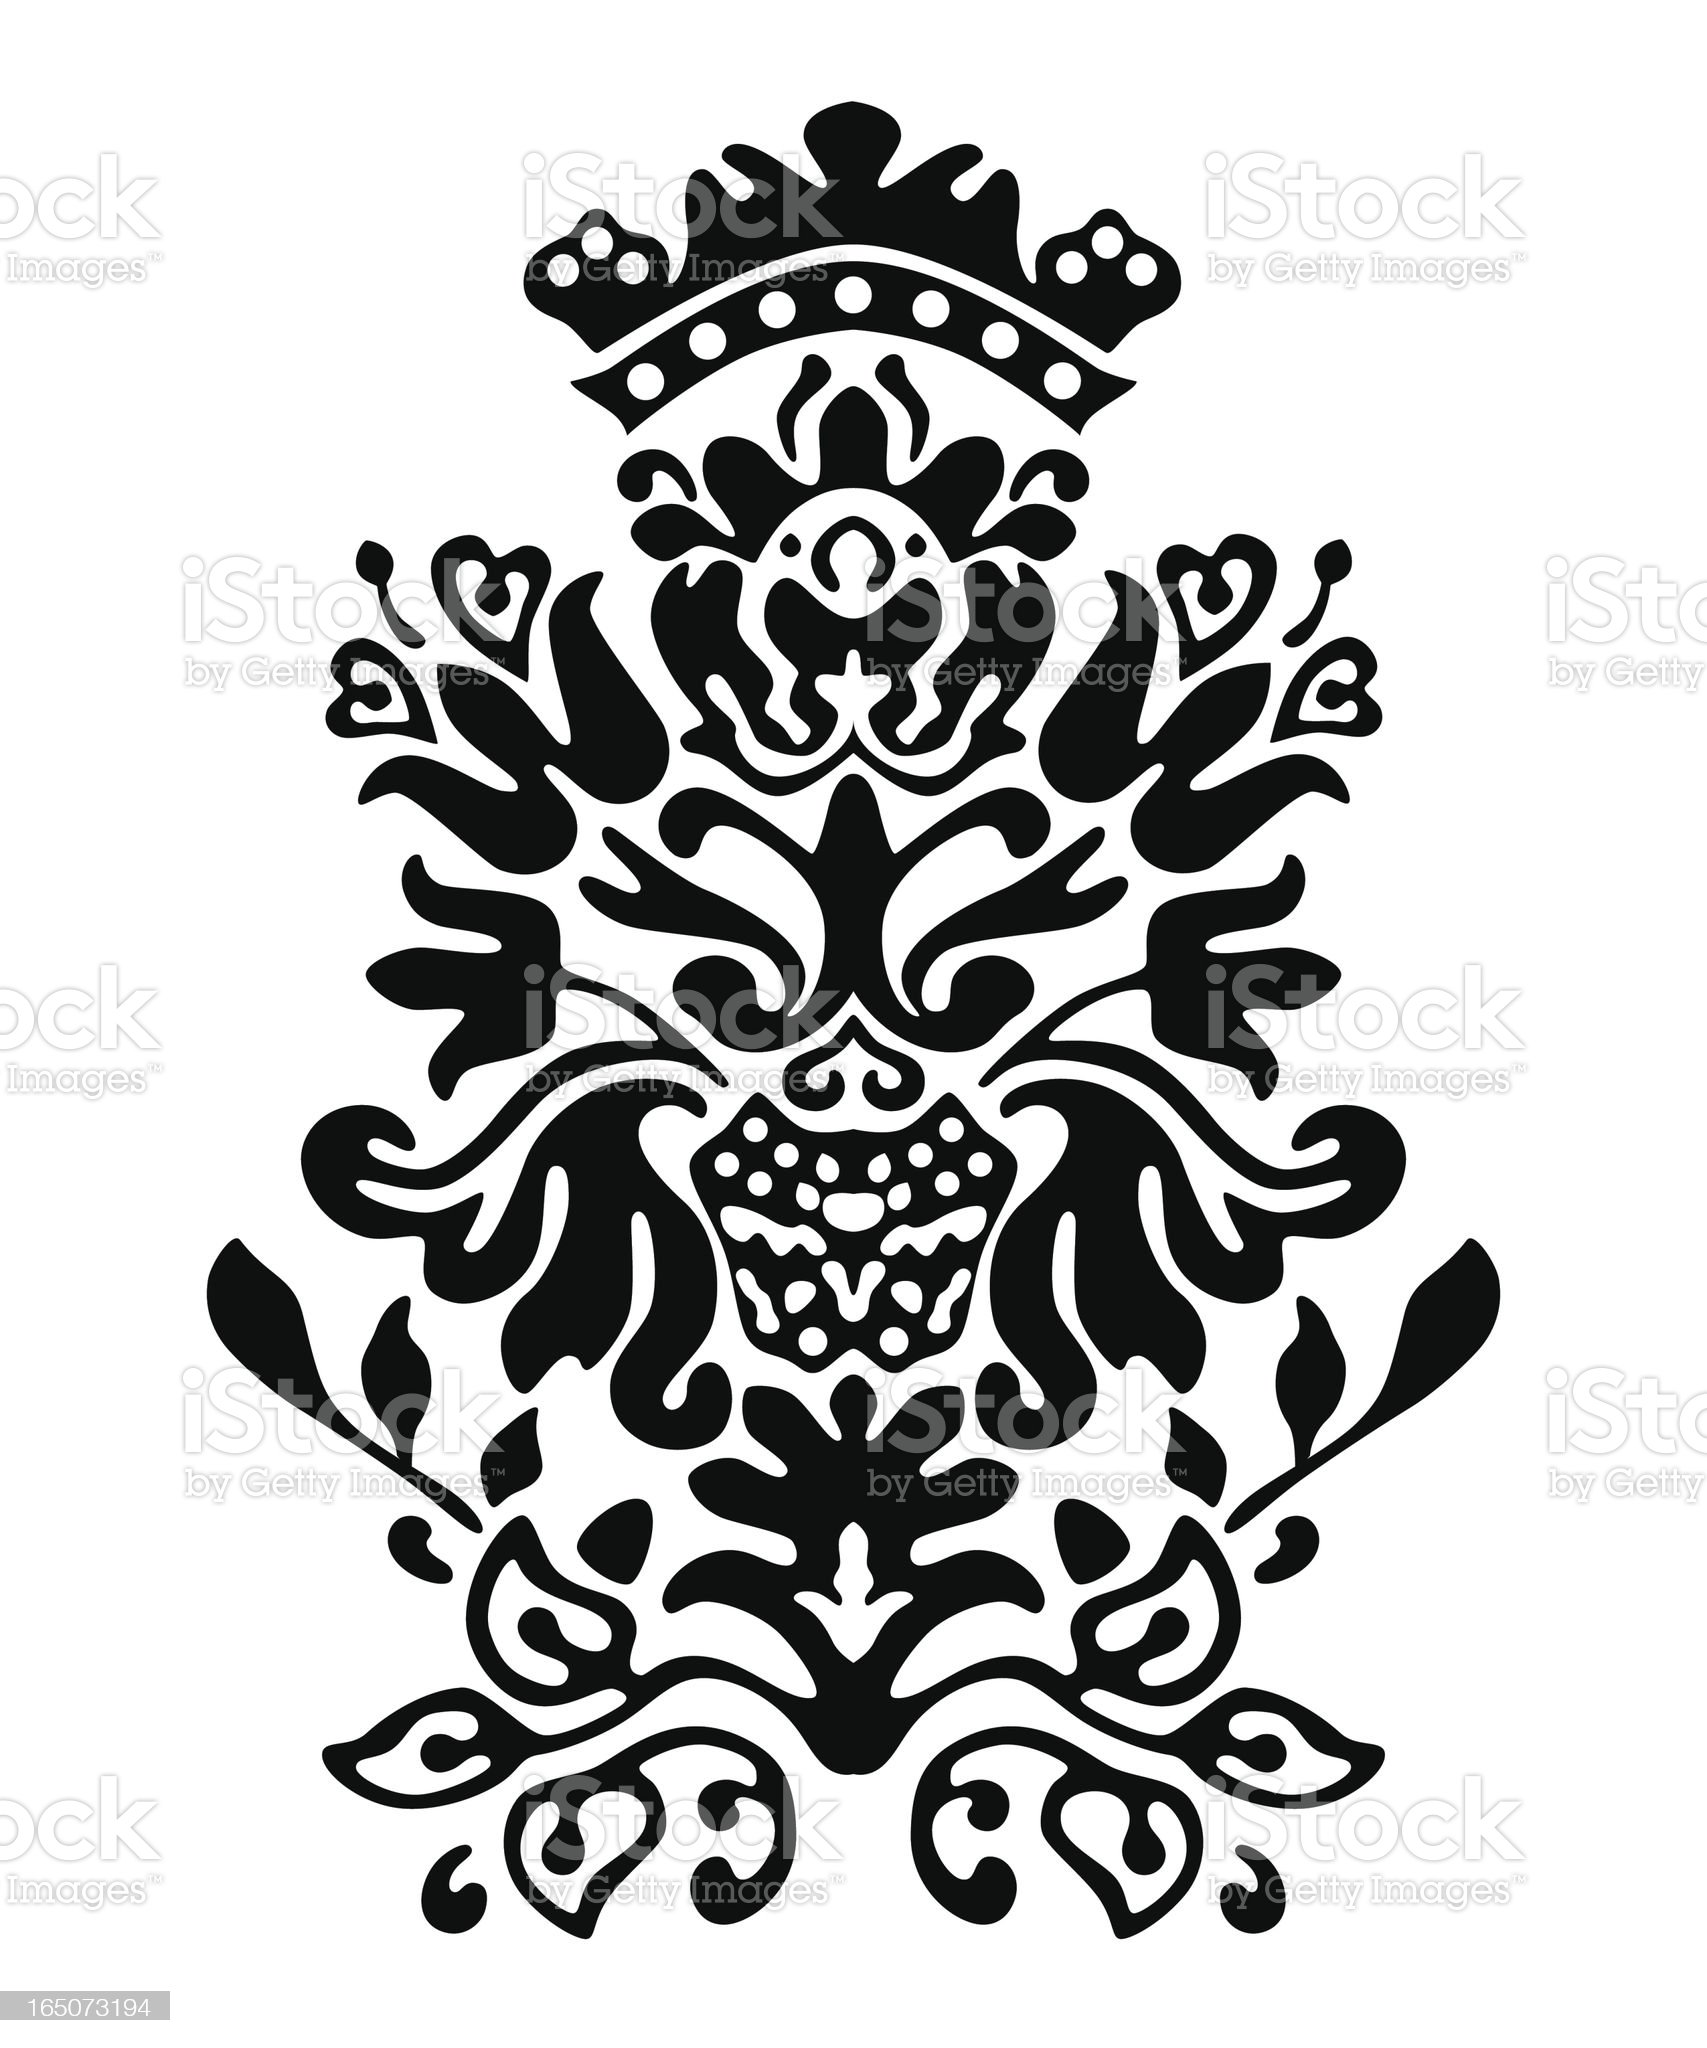 Colonial Motif Vector royalty-free stock vector art